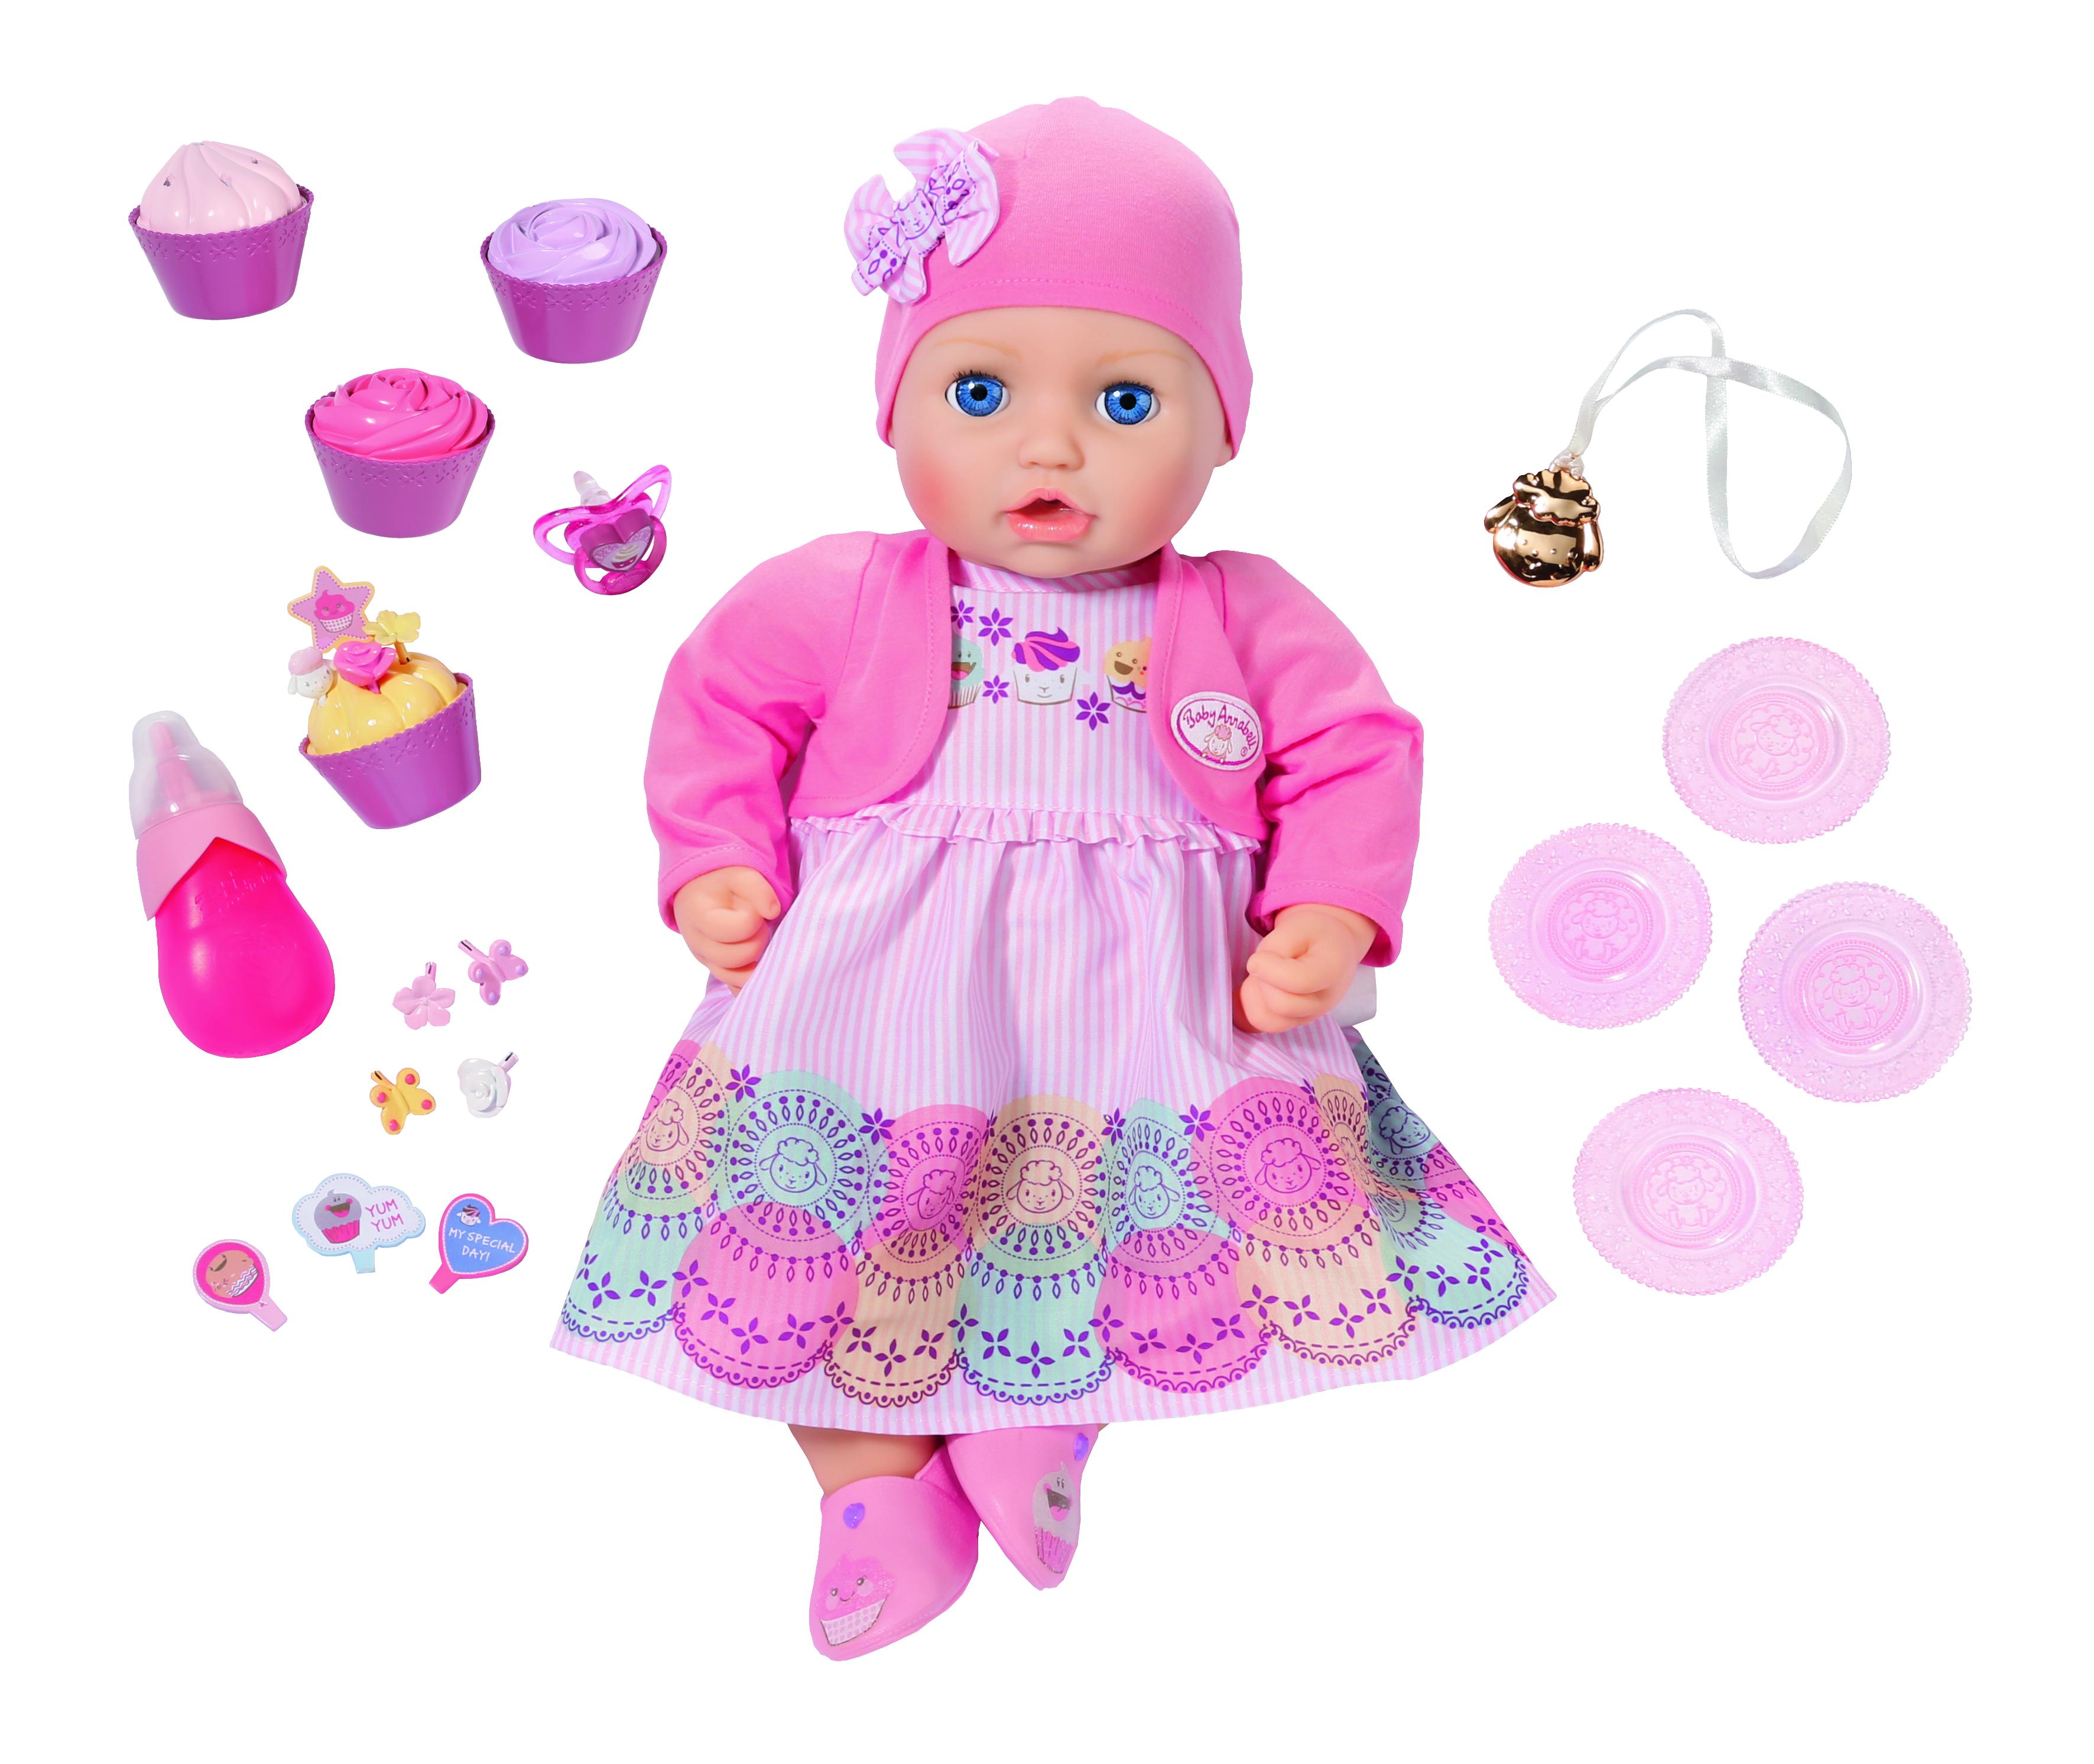 Другие куклы Zapf Creation Кукла многофункциональная Zapf Creation Baby Annabell «Праздничная» 43 см zapf creation нижнее белье белый baby annabell